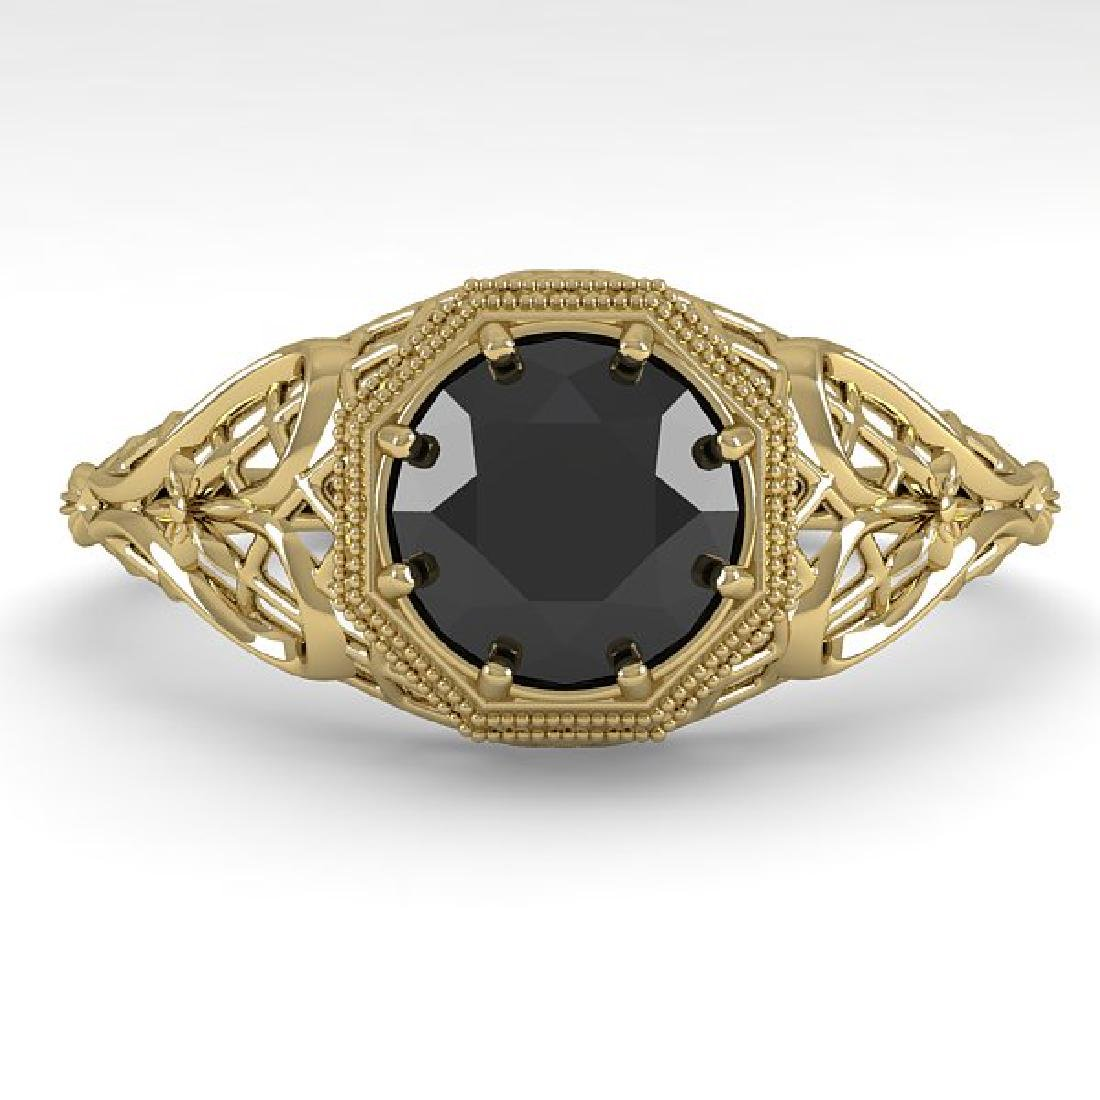 1.0 CTW Black Certified Diamond Ring Art Deco 14K